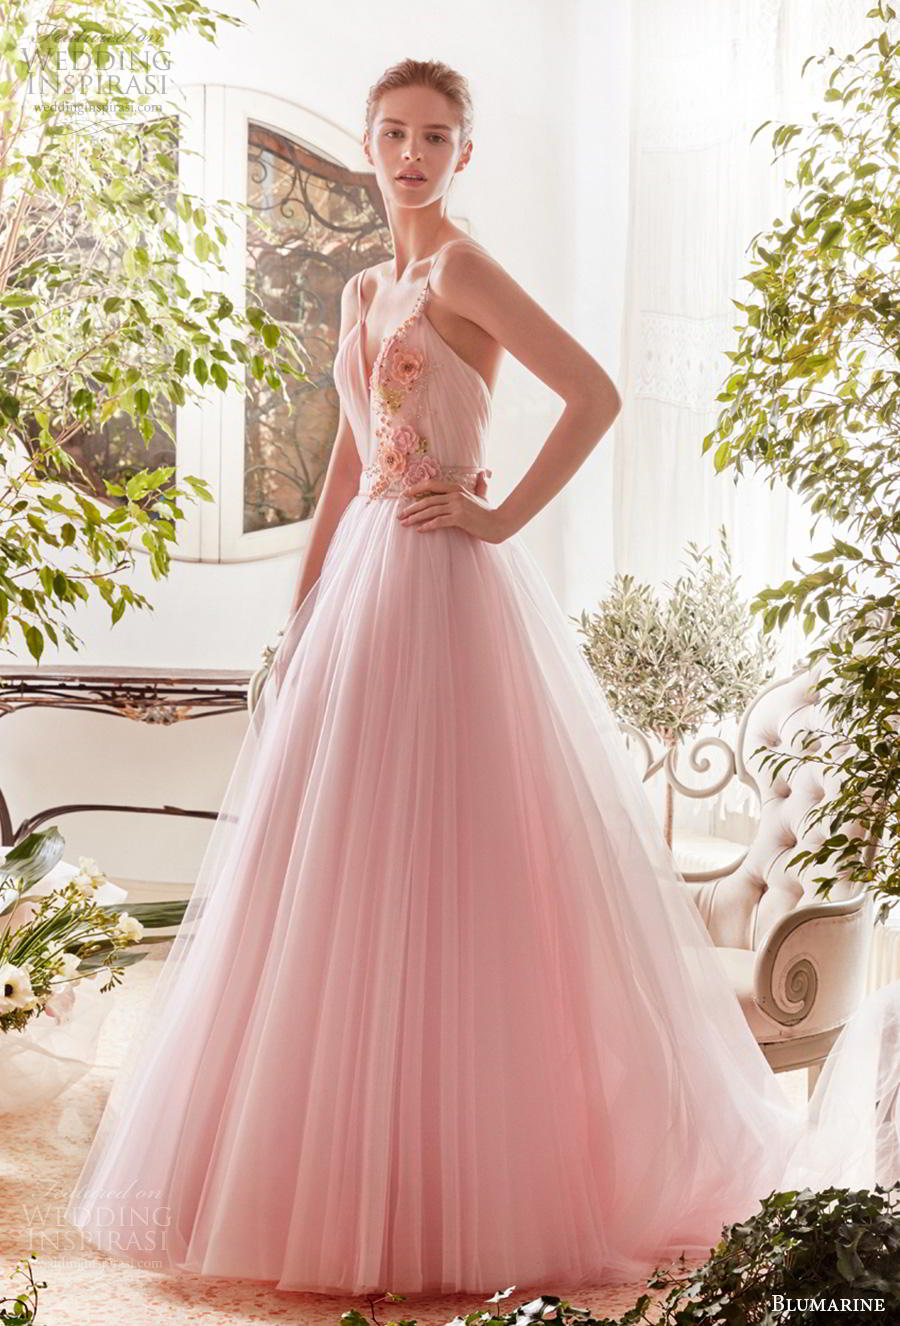 blumarine sposa 2019 bridal sleeveless thin strap sweetheart neckline ruched bodice tulle skirt romantic pink a  linw wedding dress open v back medium train (1) mv